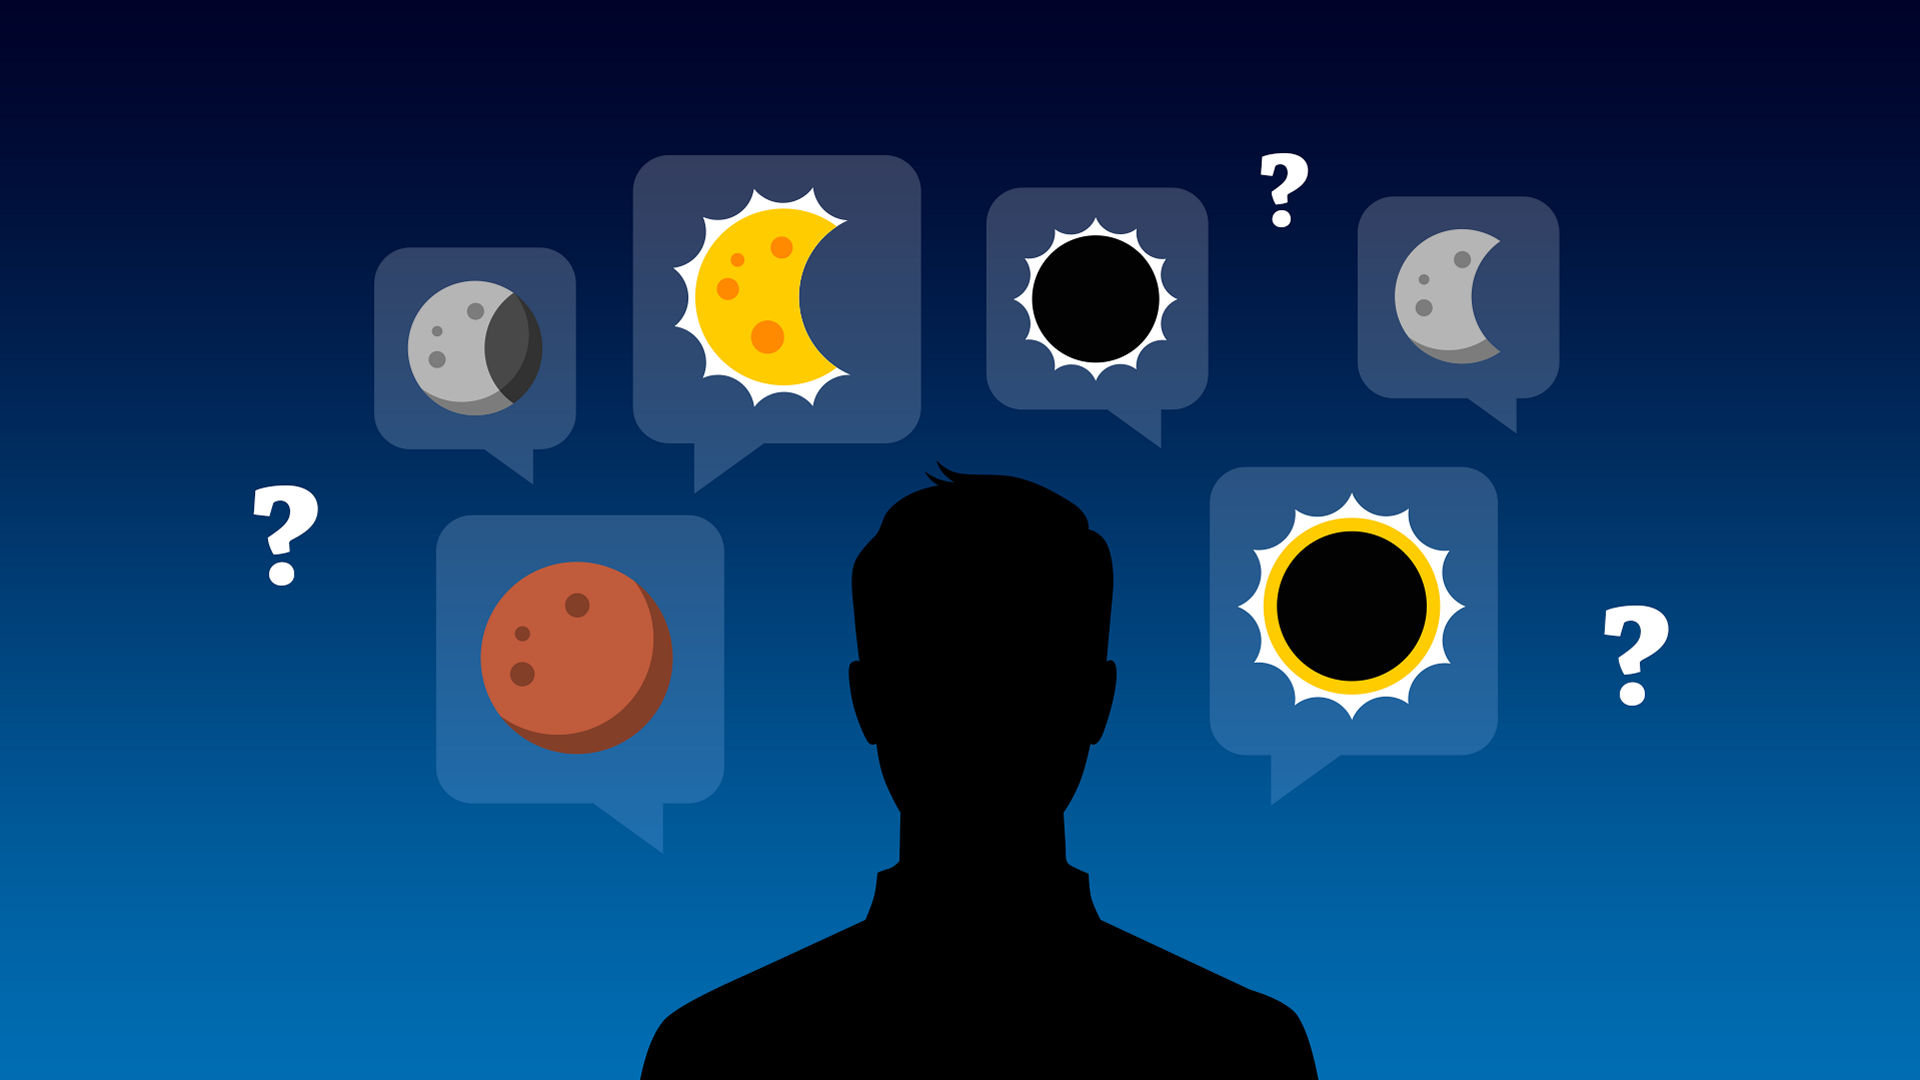 Eclipseクイズ